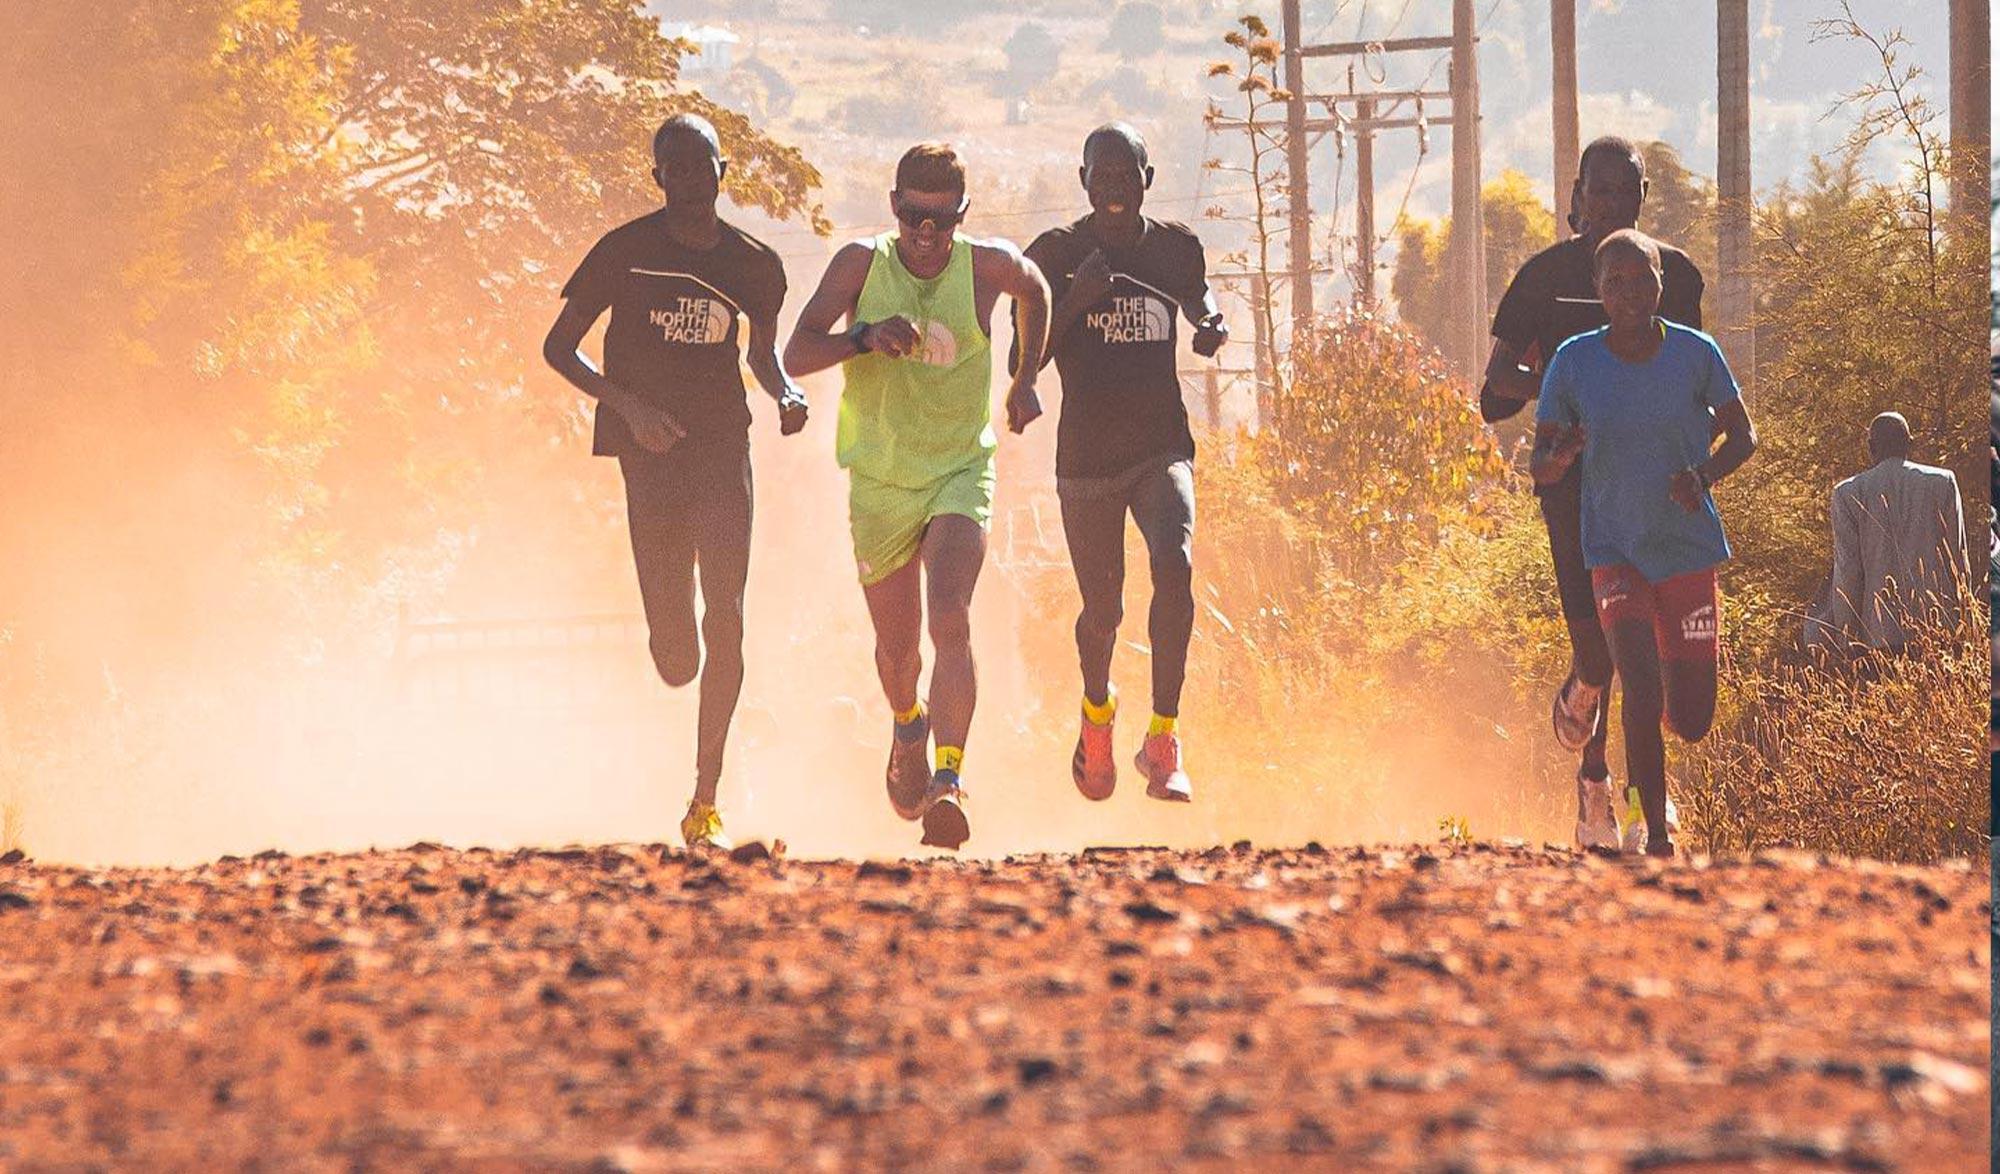 Paul Capell s'entraîne au Kenya avec Eliud Kipchoge